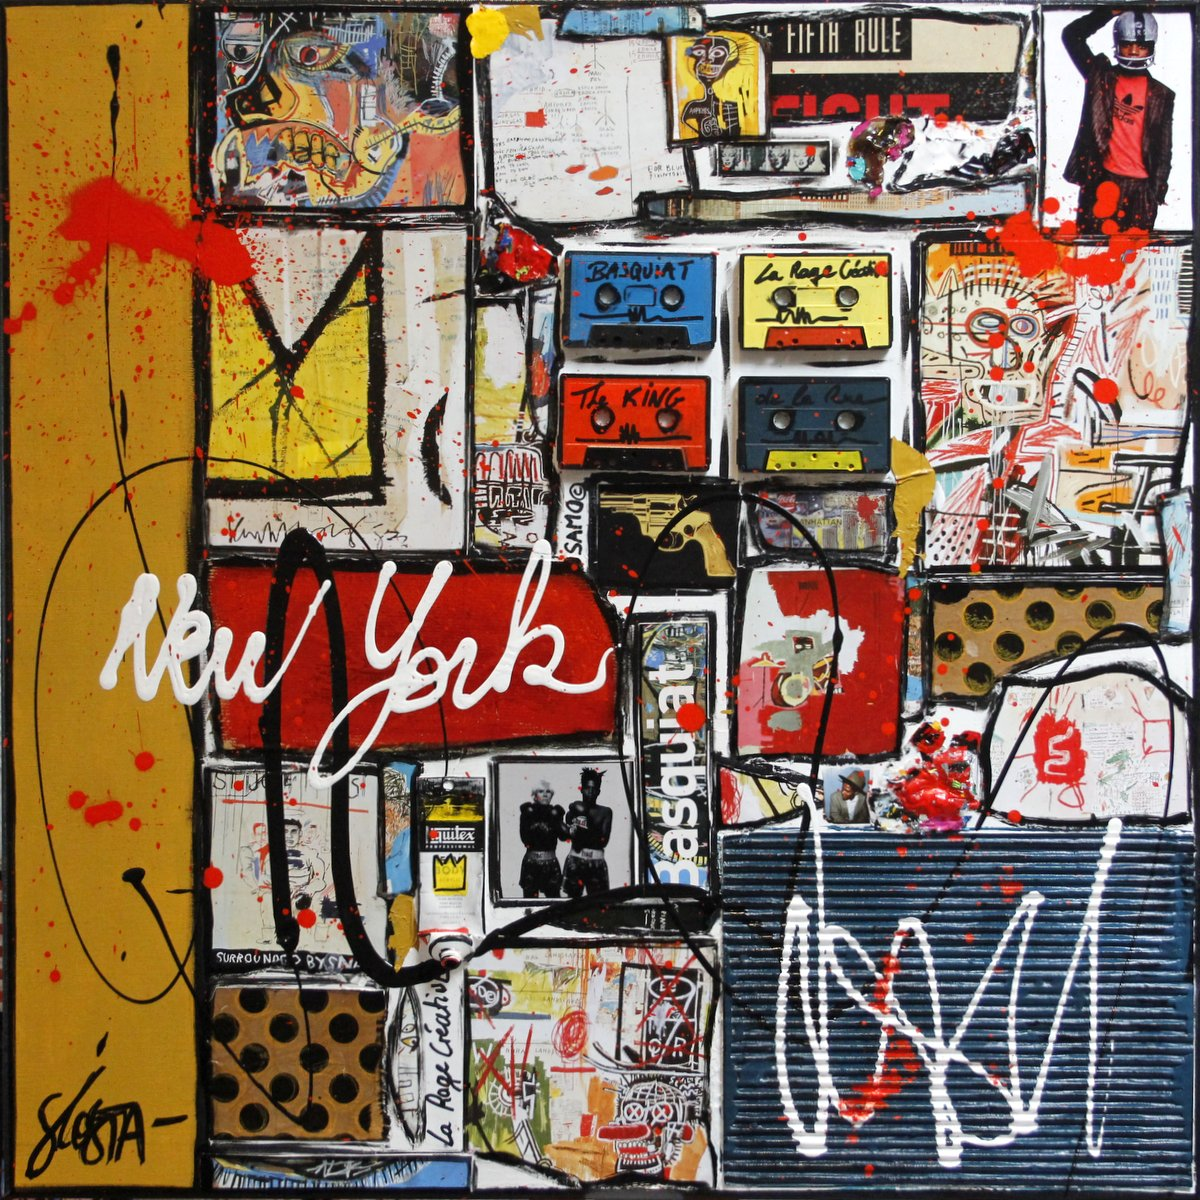 collage, new york, basquiat Tableau Contemporain, Basquiat à New York. Sophie Costa, artiste peintre.